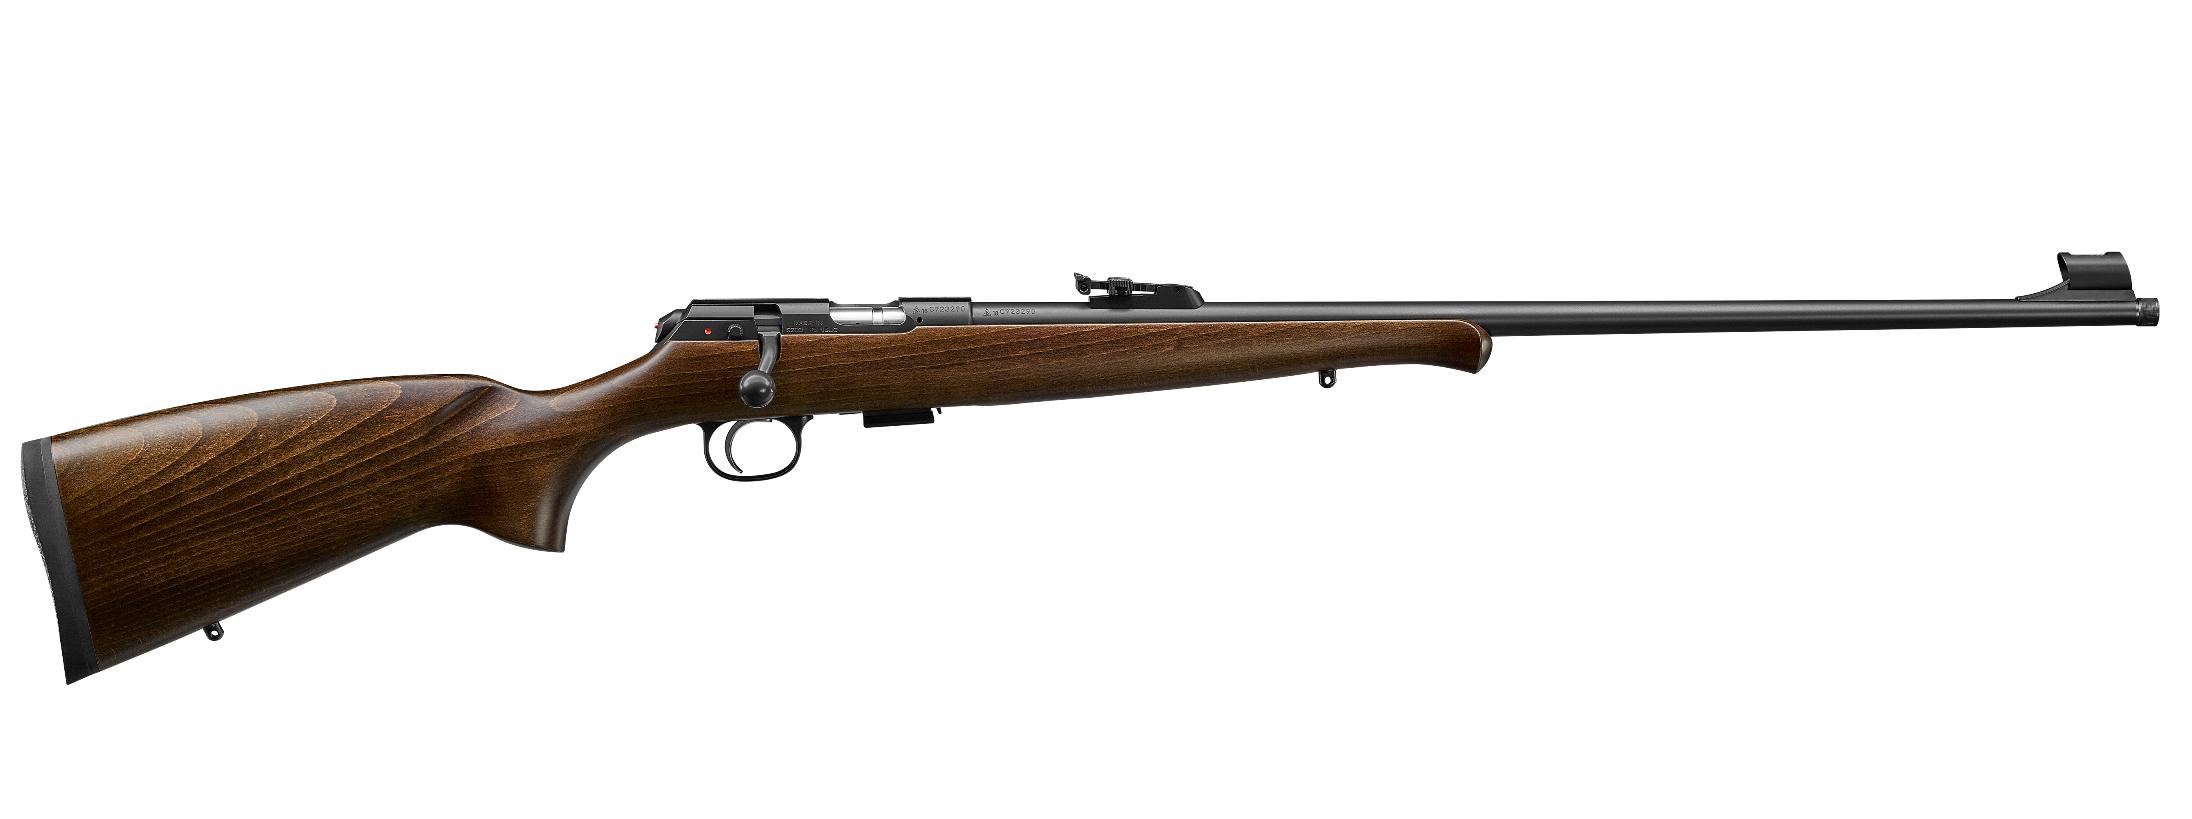 cz_457_training_rifle_right